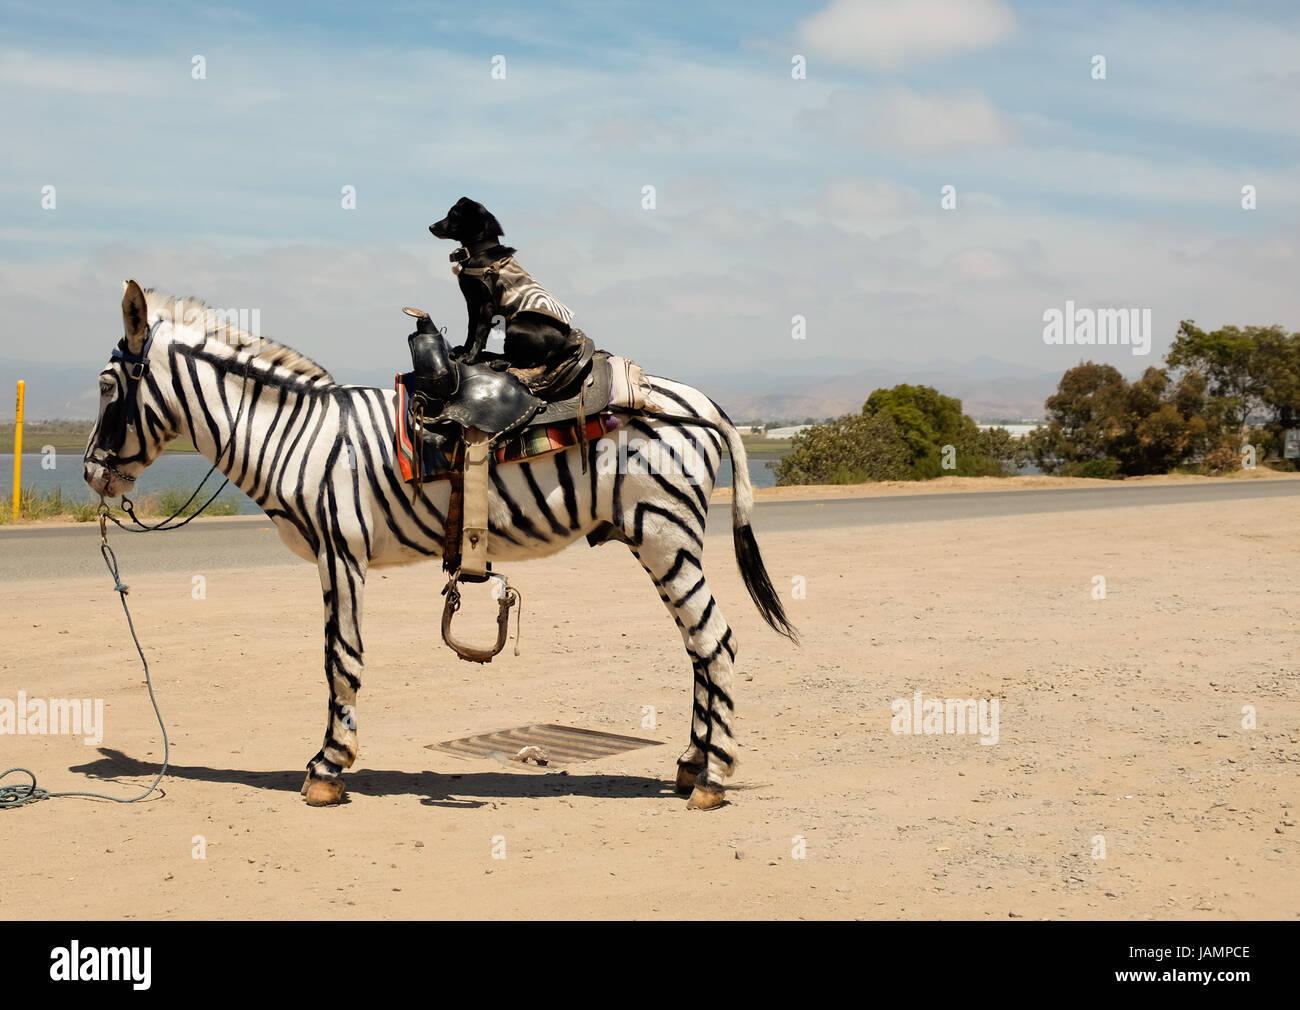 Horse Zebra Stripes Painted On Stock Photos & Horse Zebra Stripes